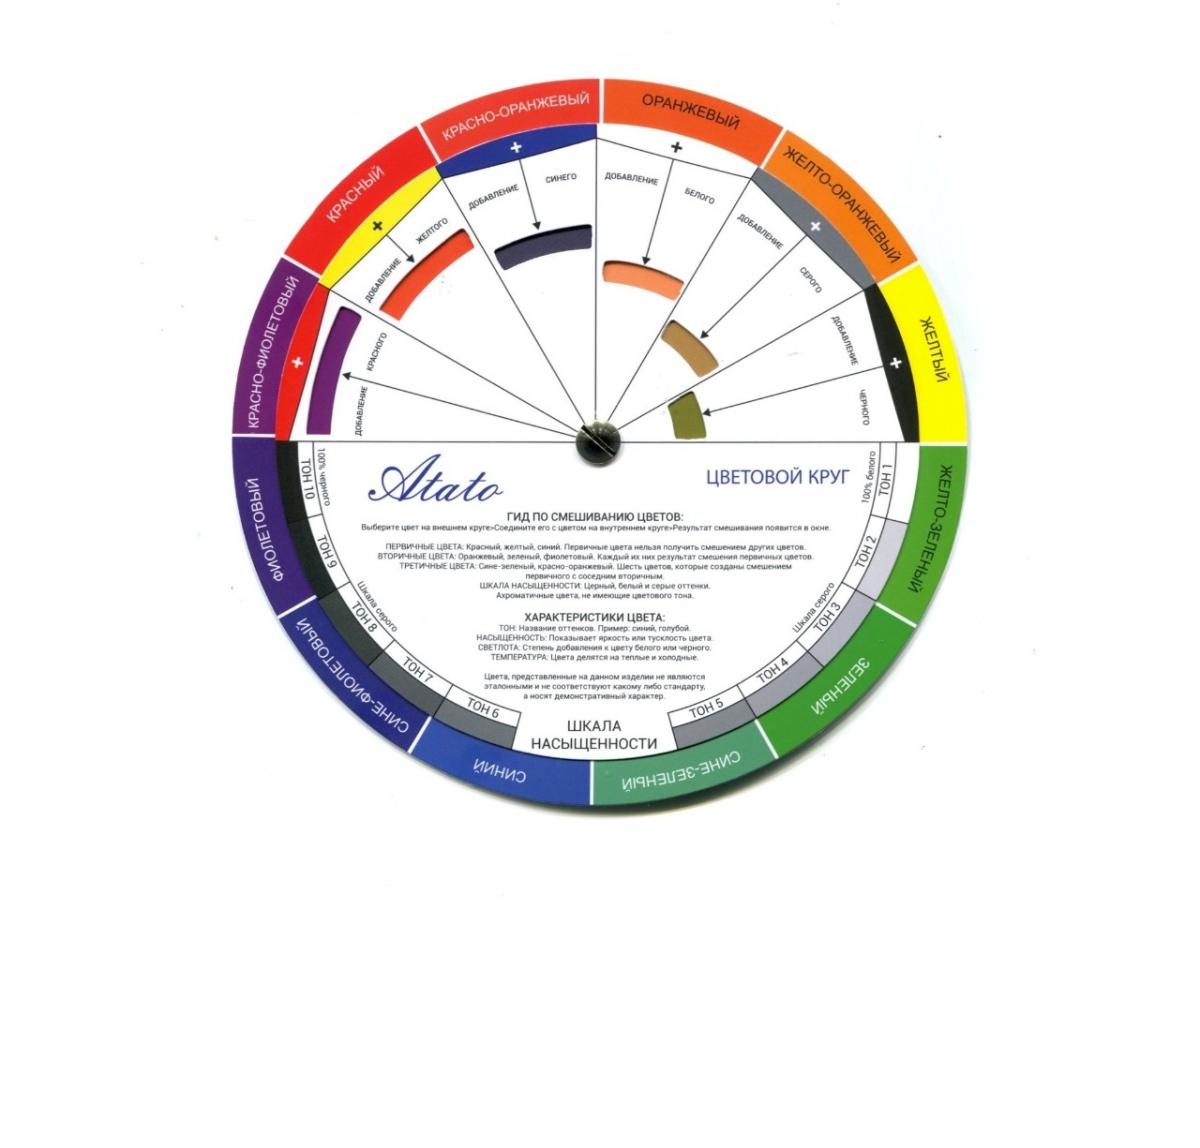 Цветовой круг Atato